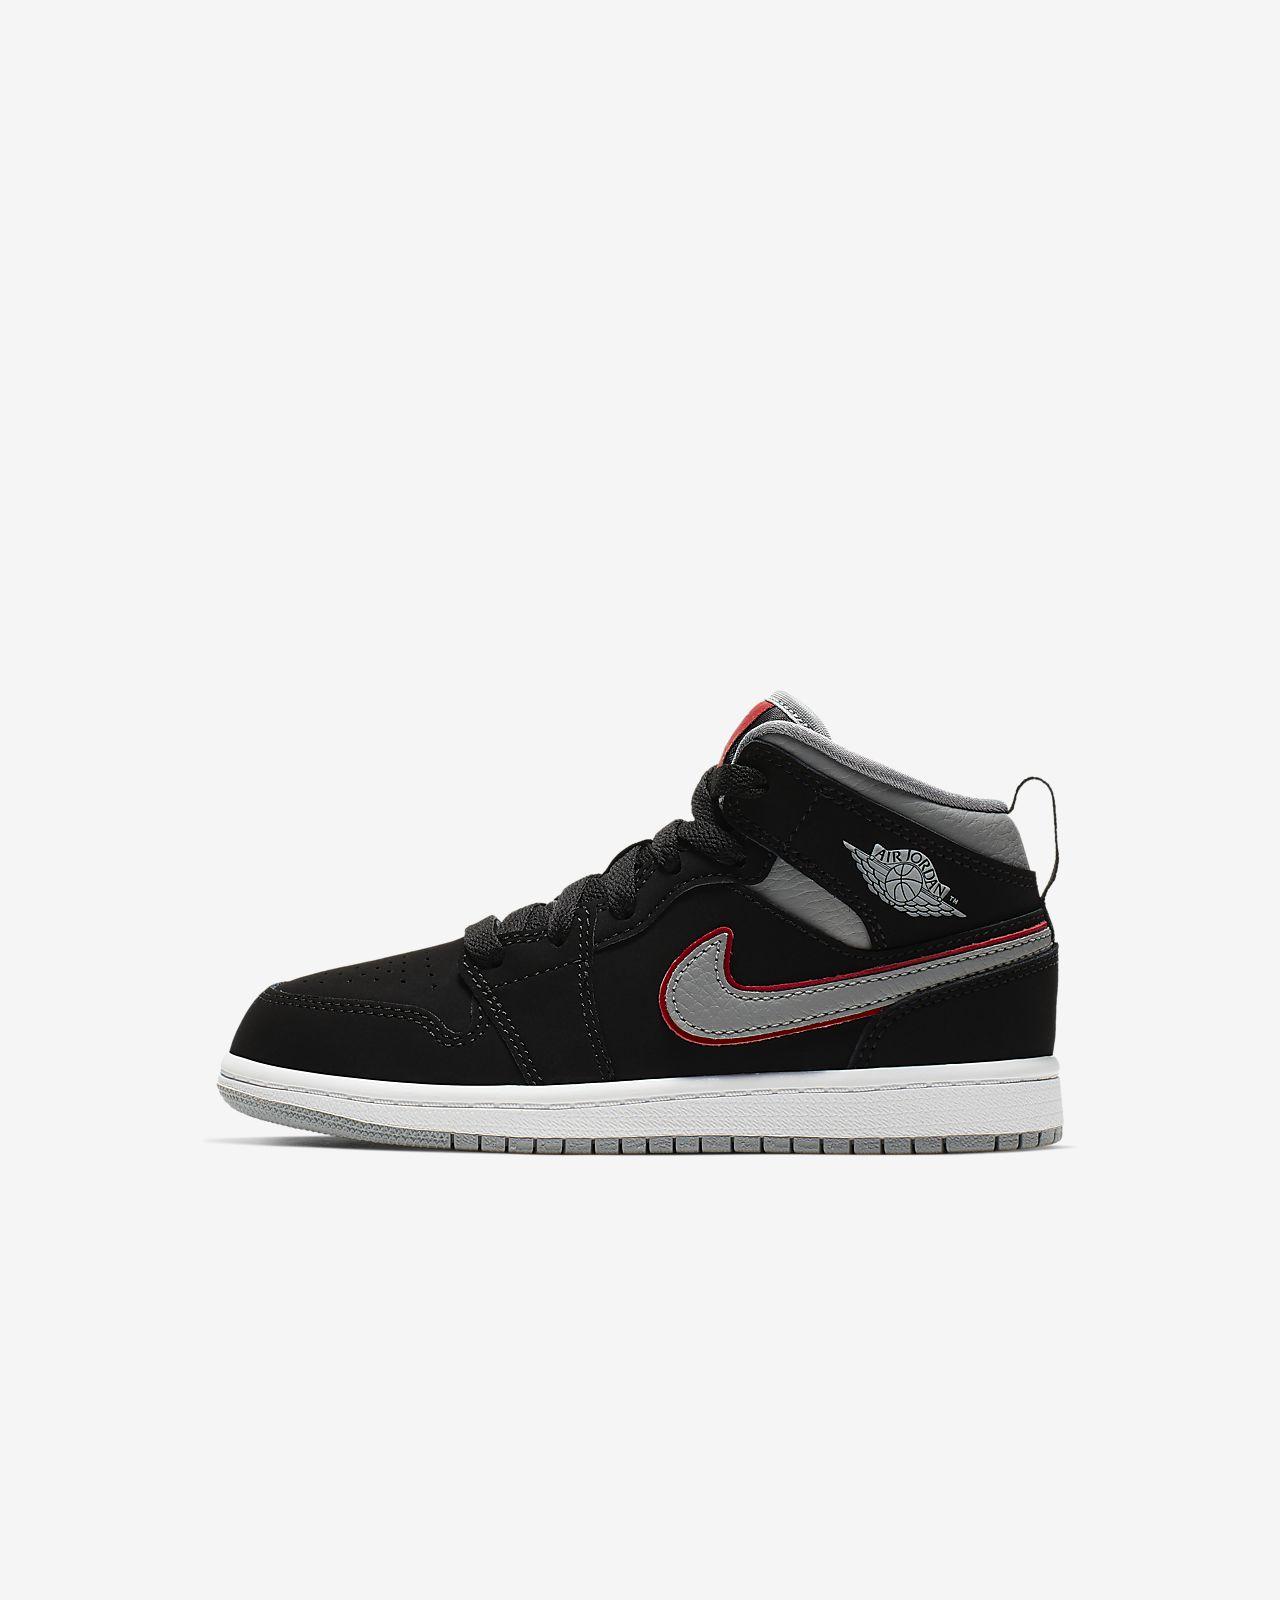 quality design 679fa 21ede Little Kids  Shoe. Air Jordan 1 Mid